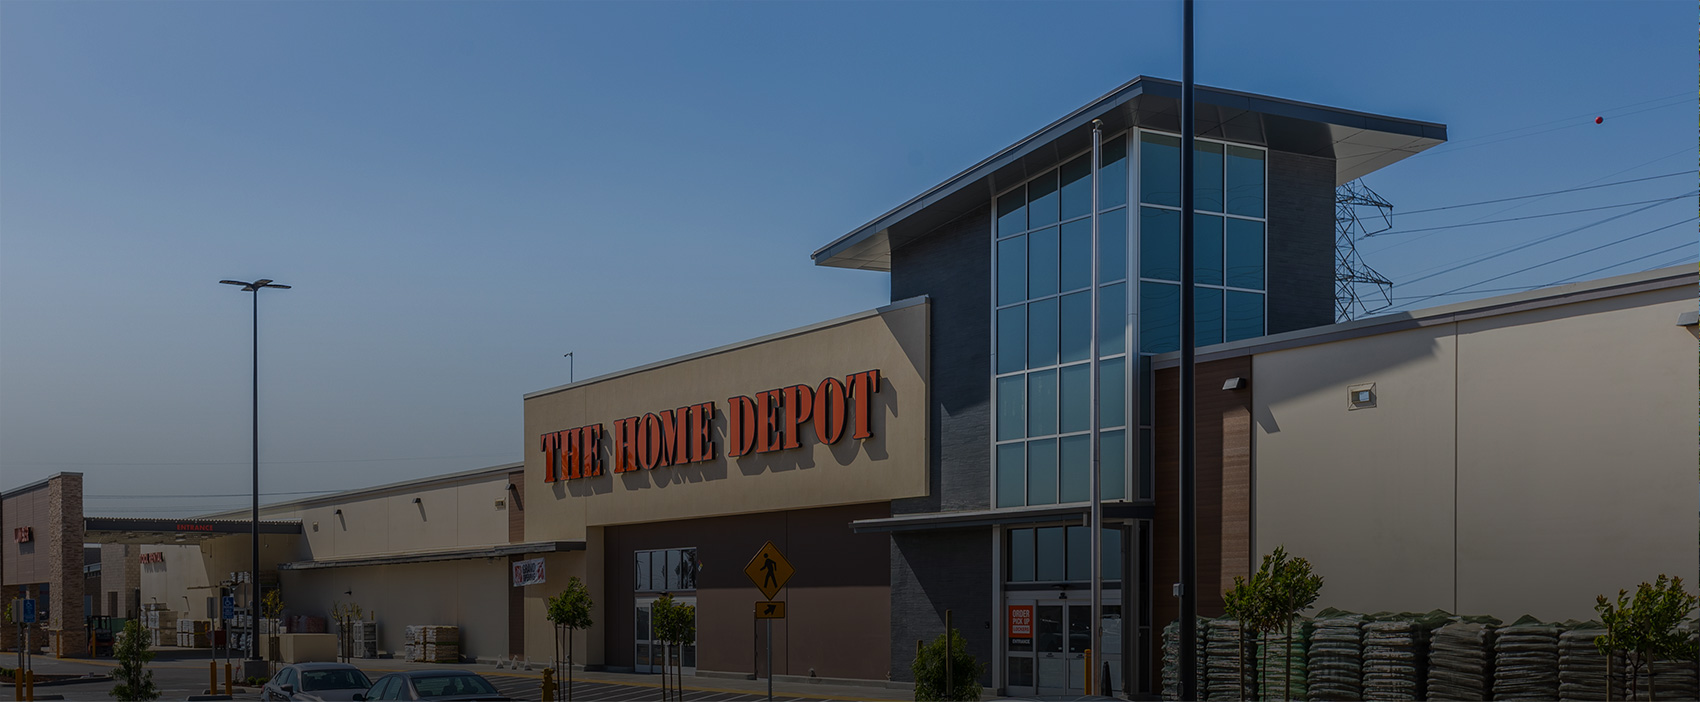 Home Depot, Monterey Park, CA